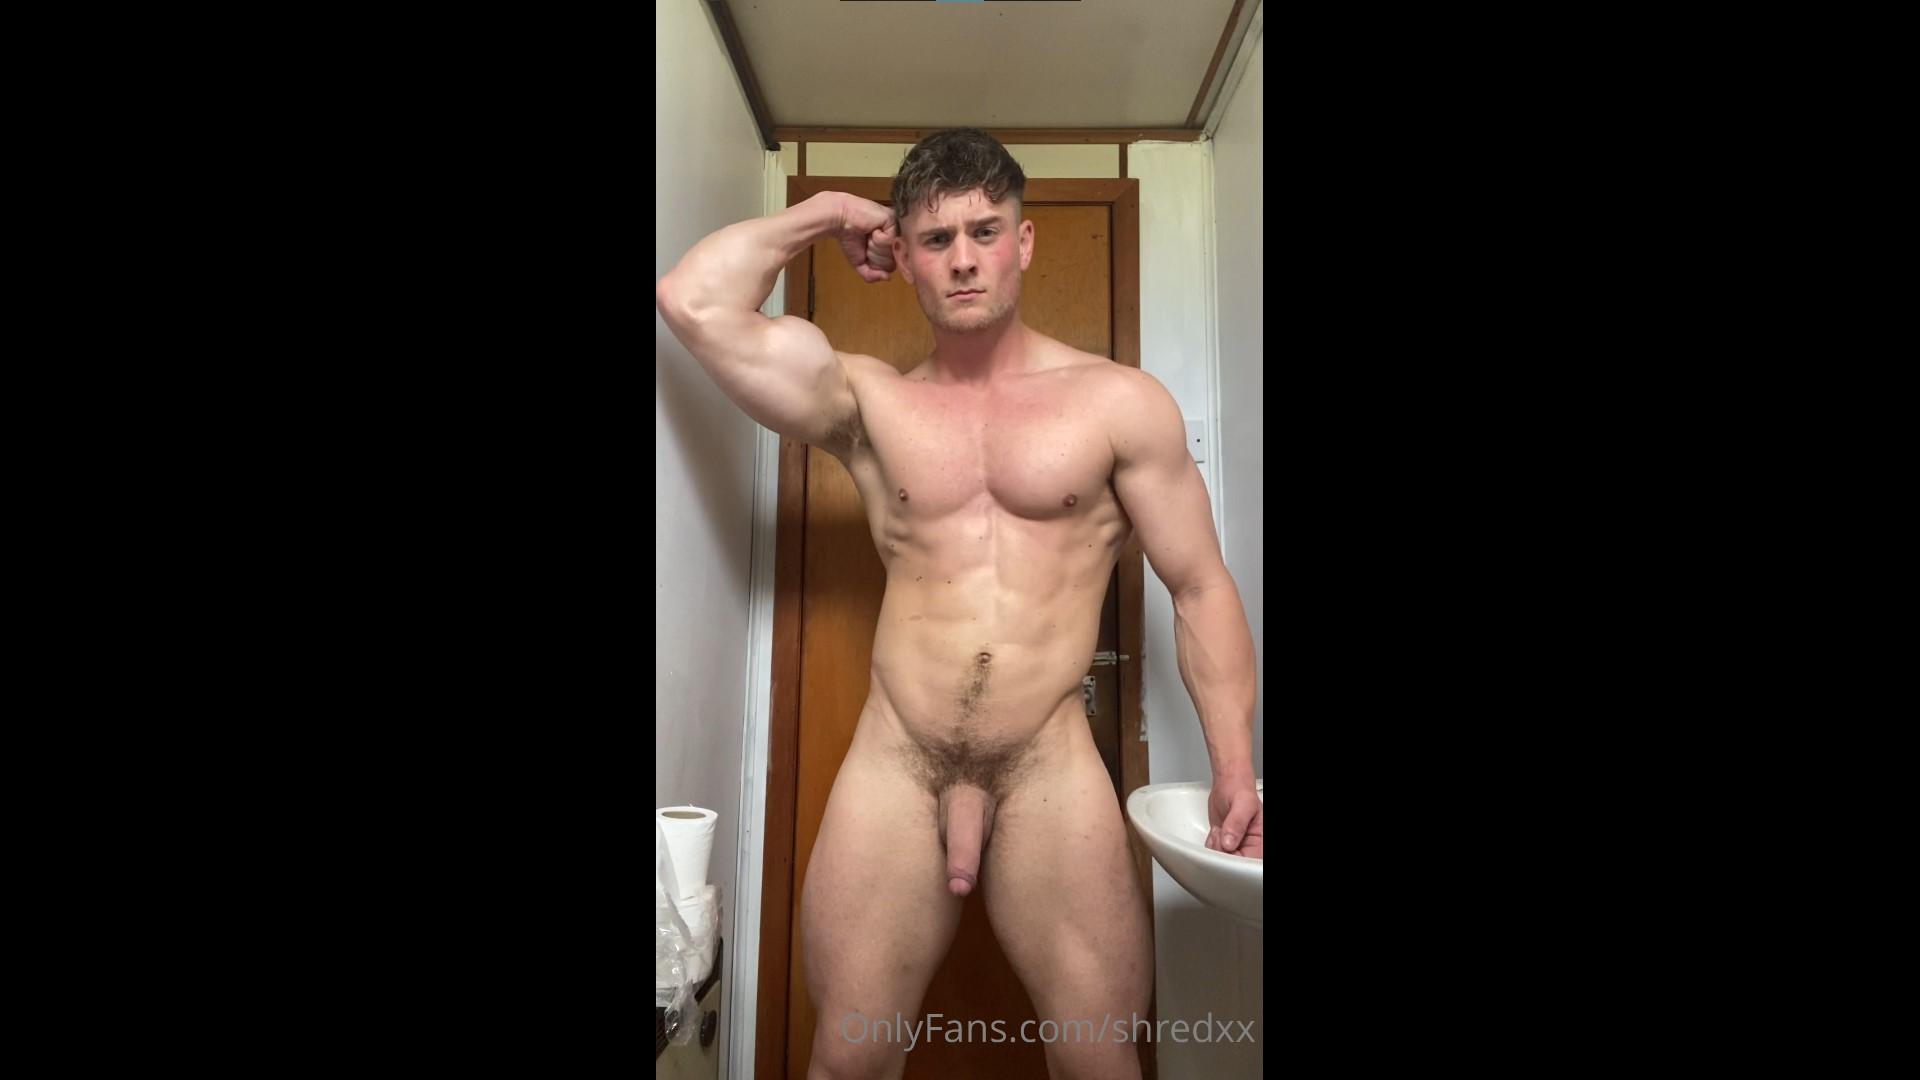 Flexing nude in the bathroom - Shredxx